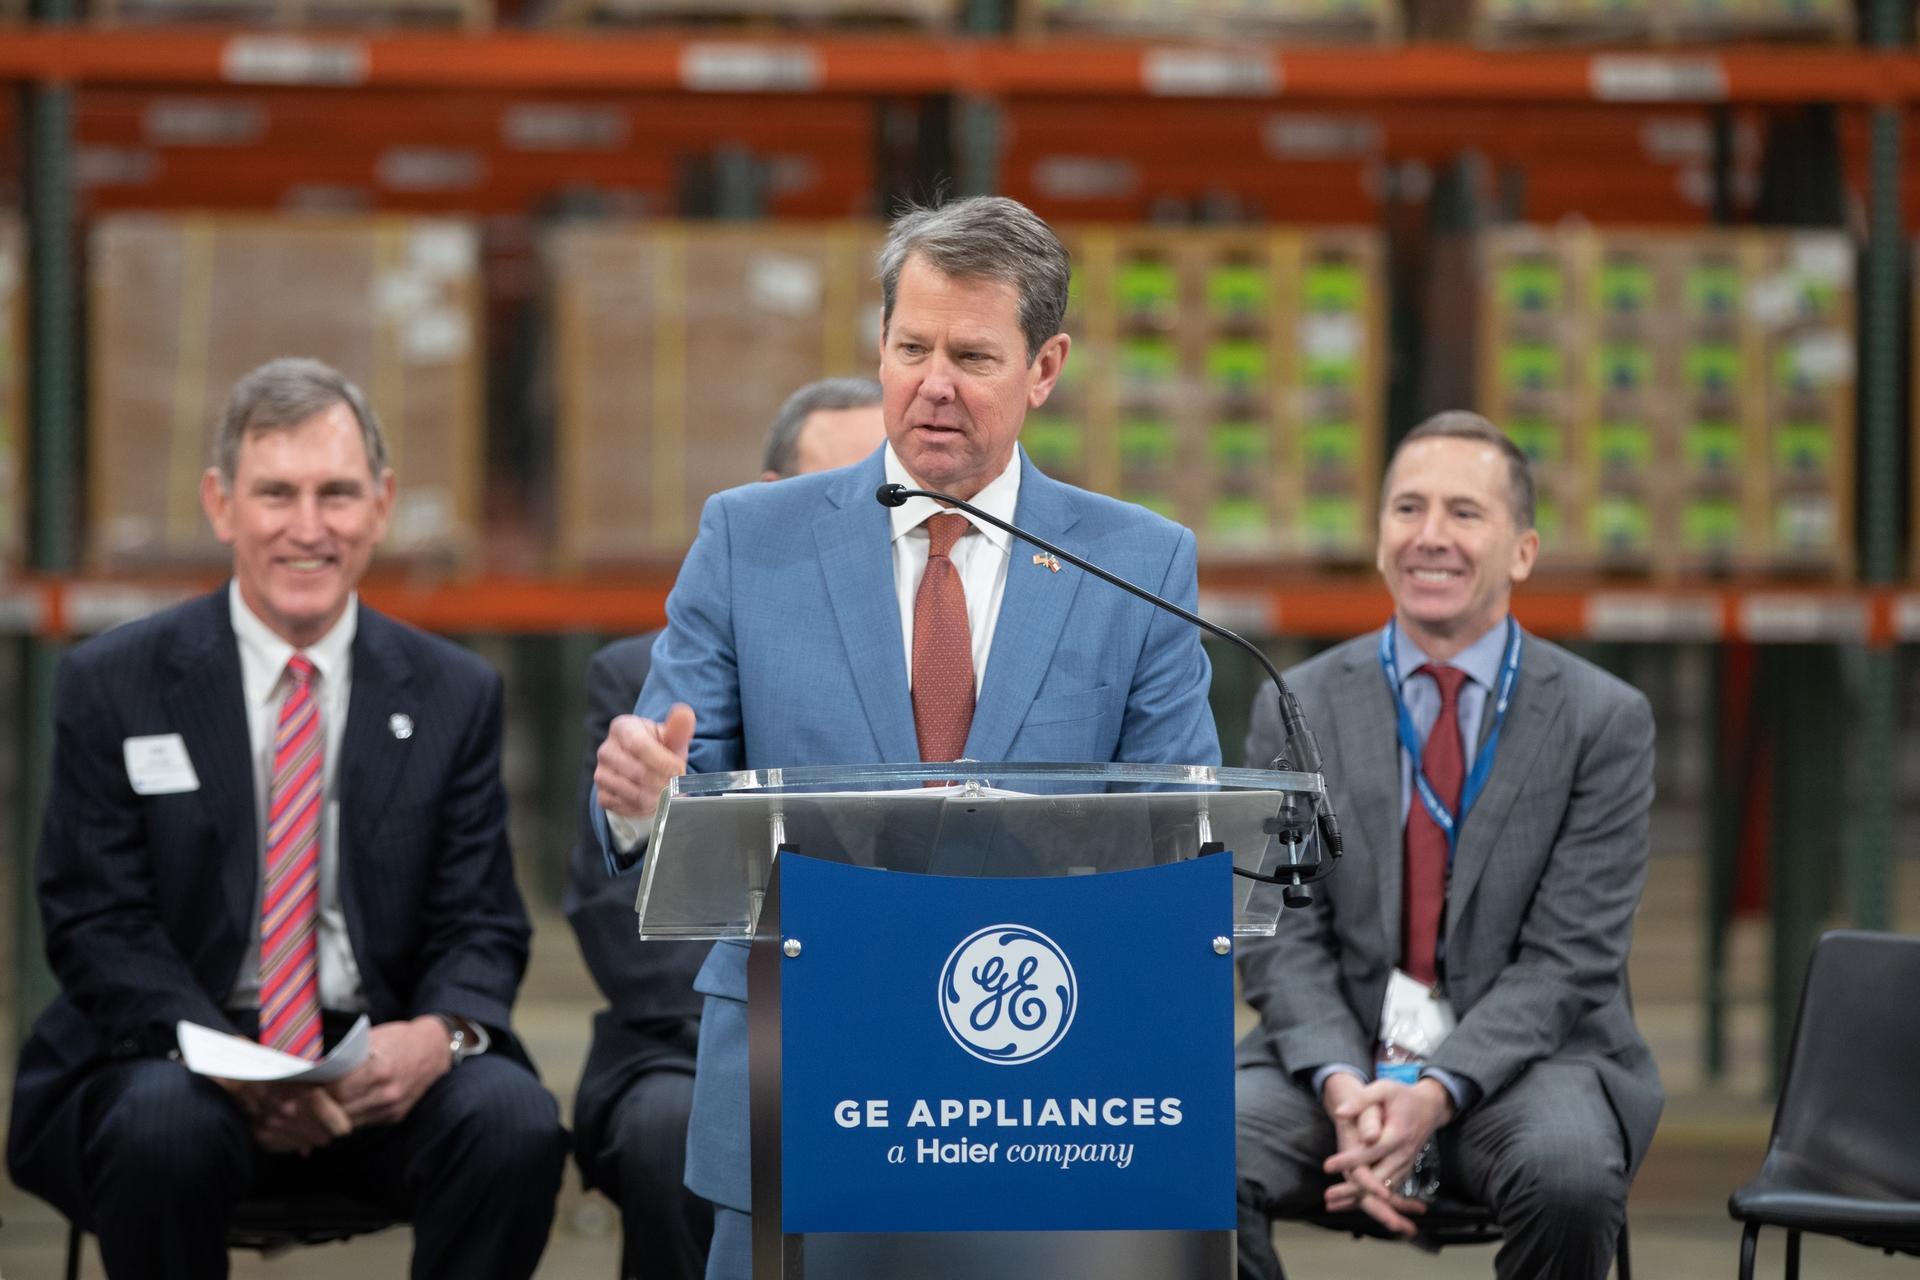 GA Gov Kemp addresses crowd during opening of GEAs Southern Logistics Center